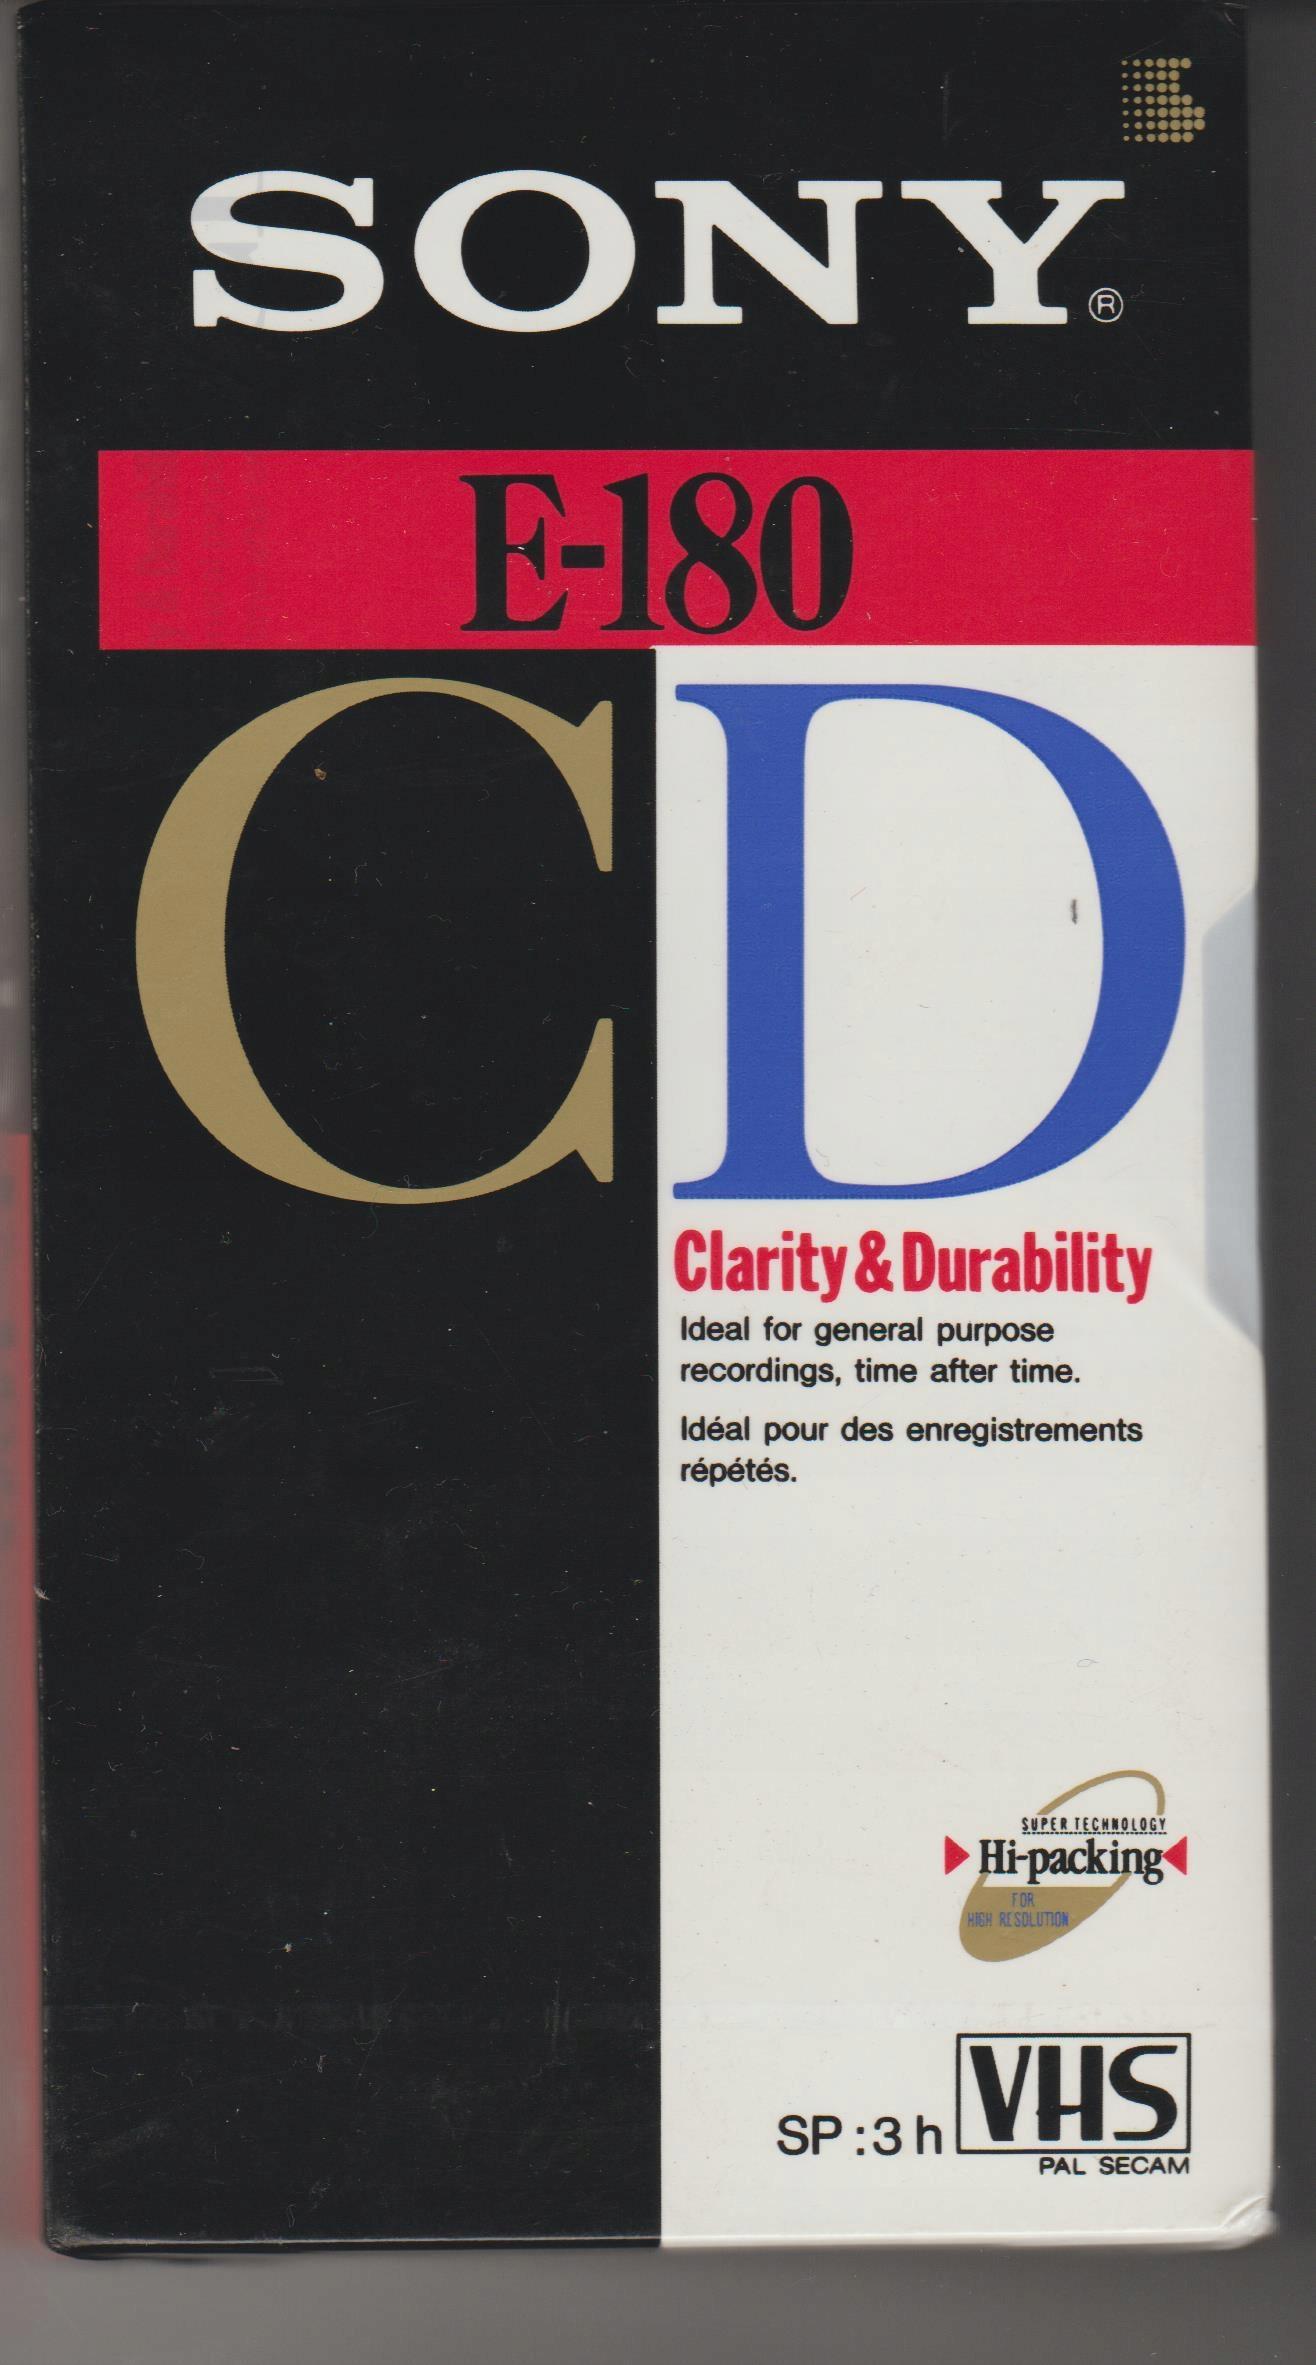 Kaseta SONY VHS E-180 NOWA, zafoliowana, 3 godziny